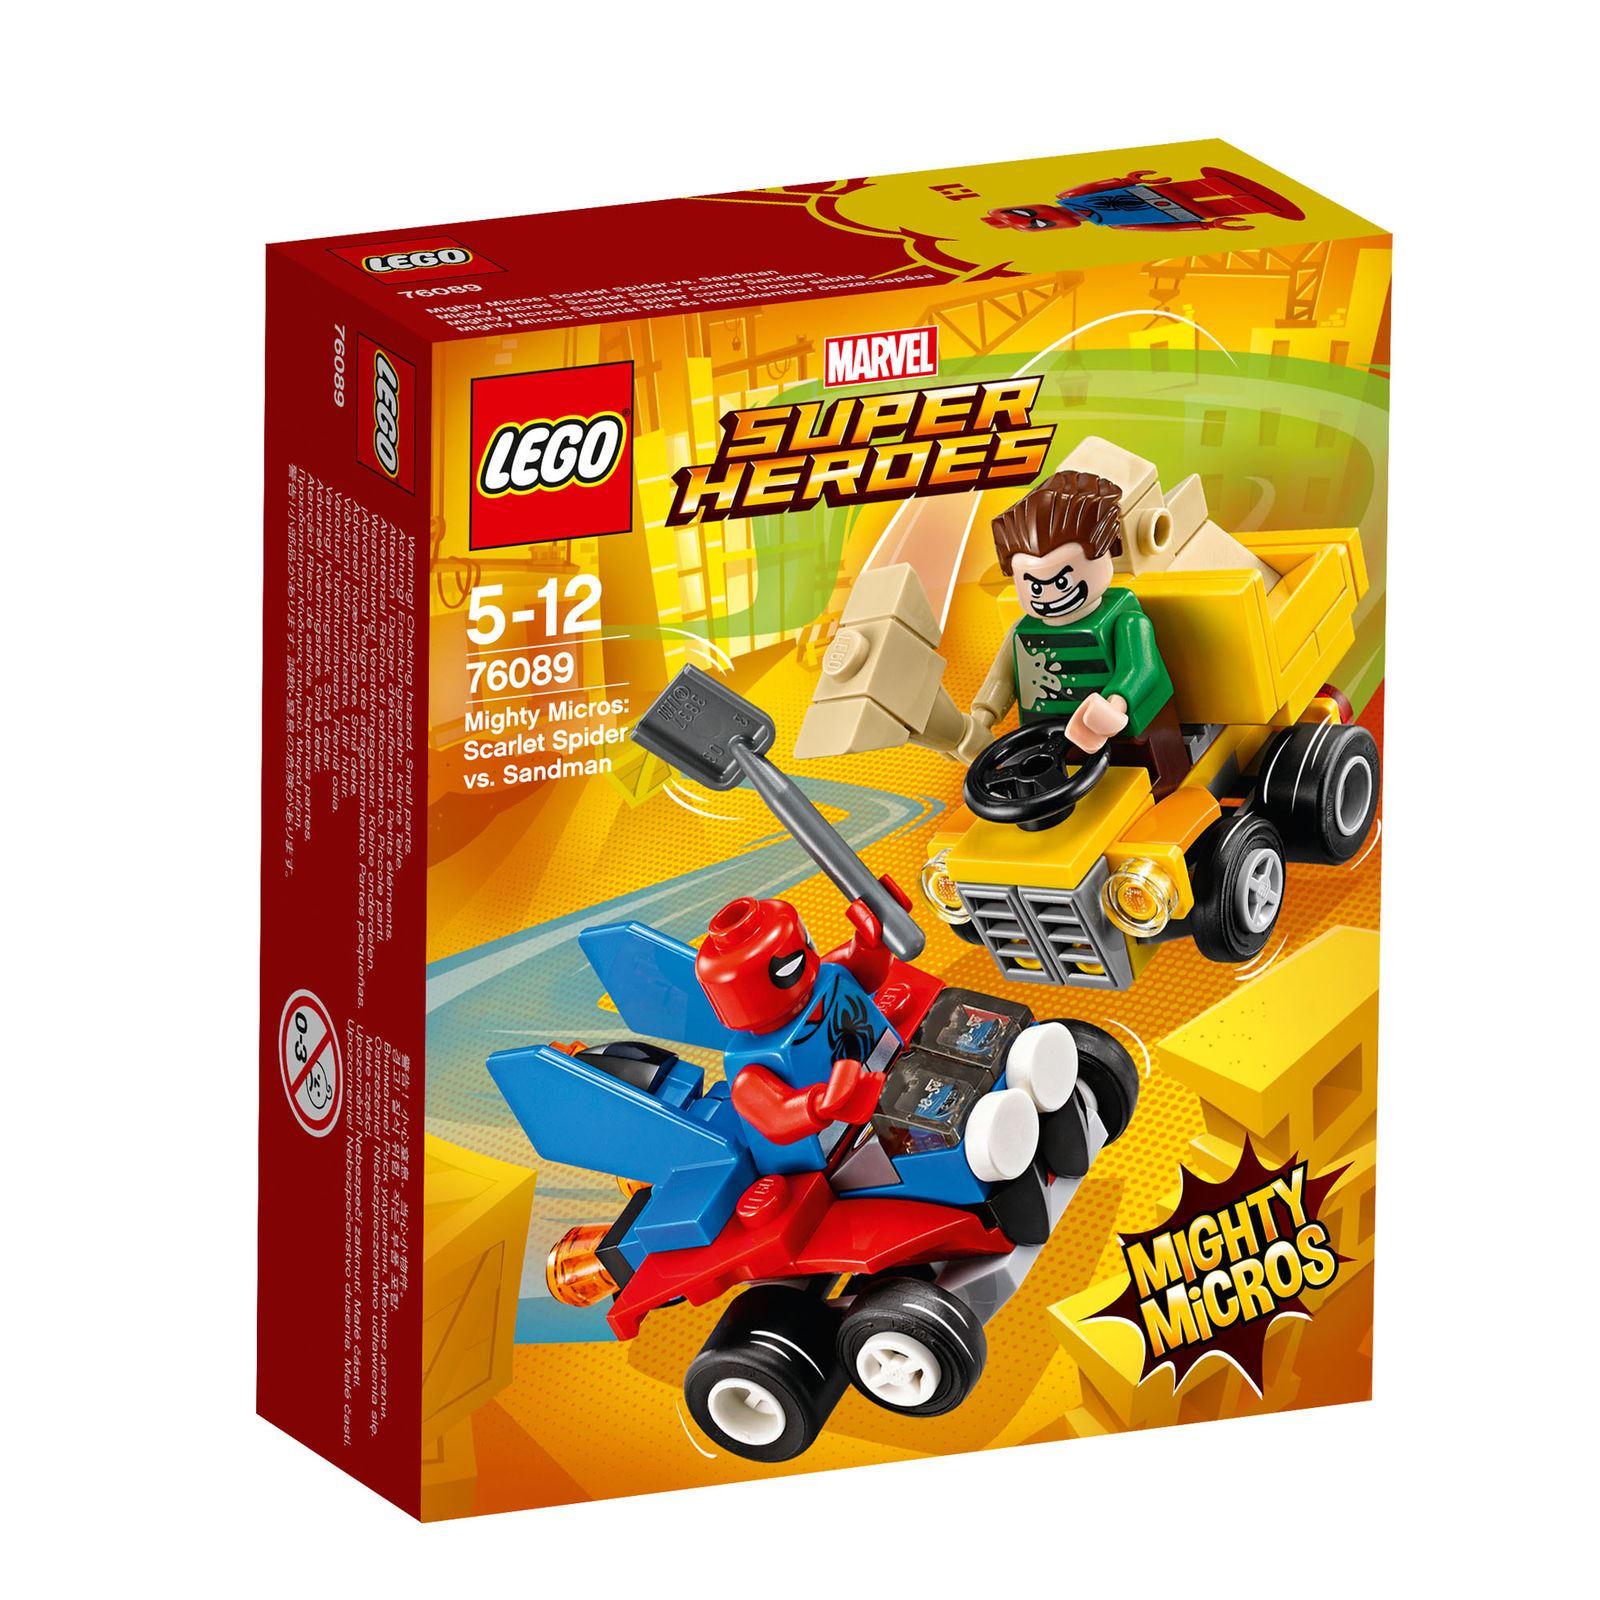 LEGO Marvel 76089 76089 76089  Super Heroes Mighty Micros  Scarlet Spider Vs. Sandman 89 Pcs 26c7c9